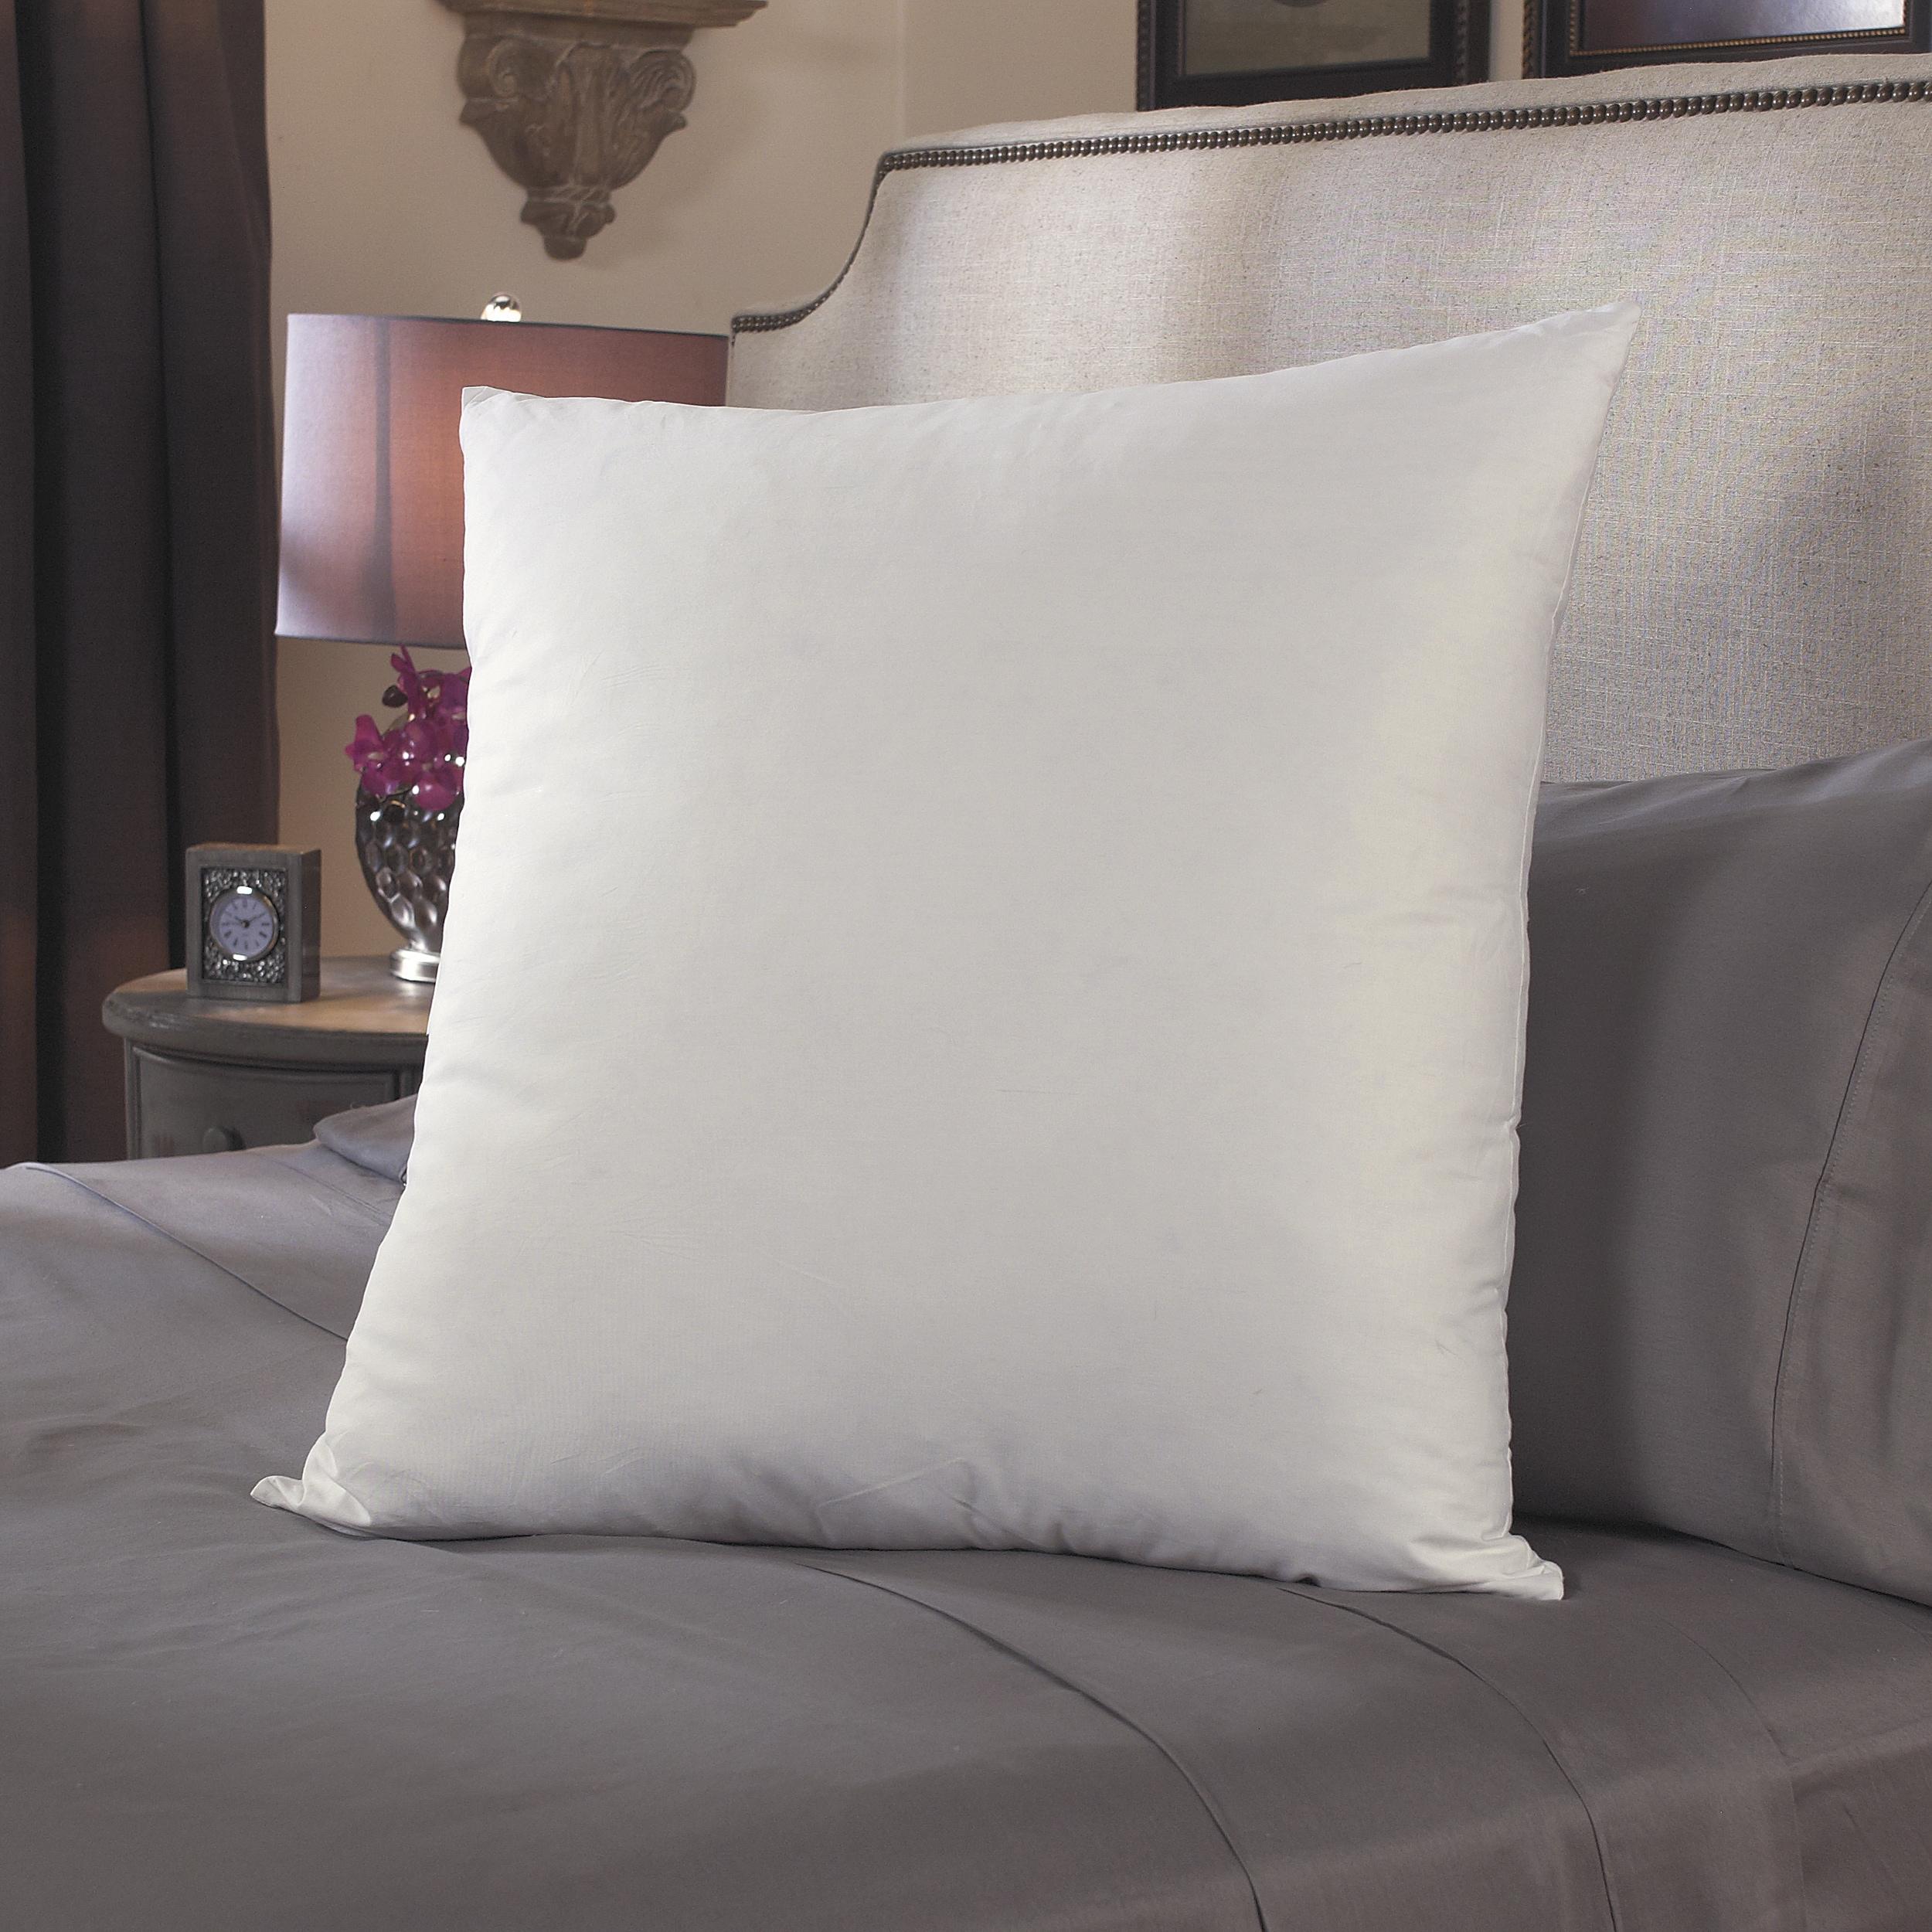 Famous Maker Decorative Euro White Feather/ Down Pillows (Set of 2)